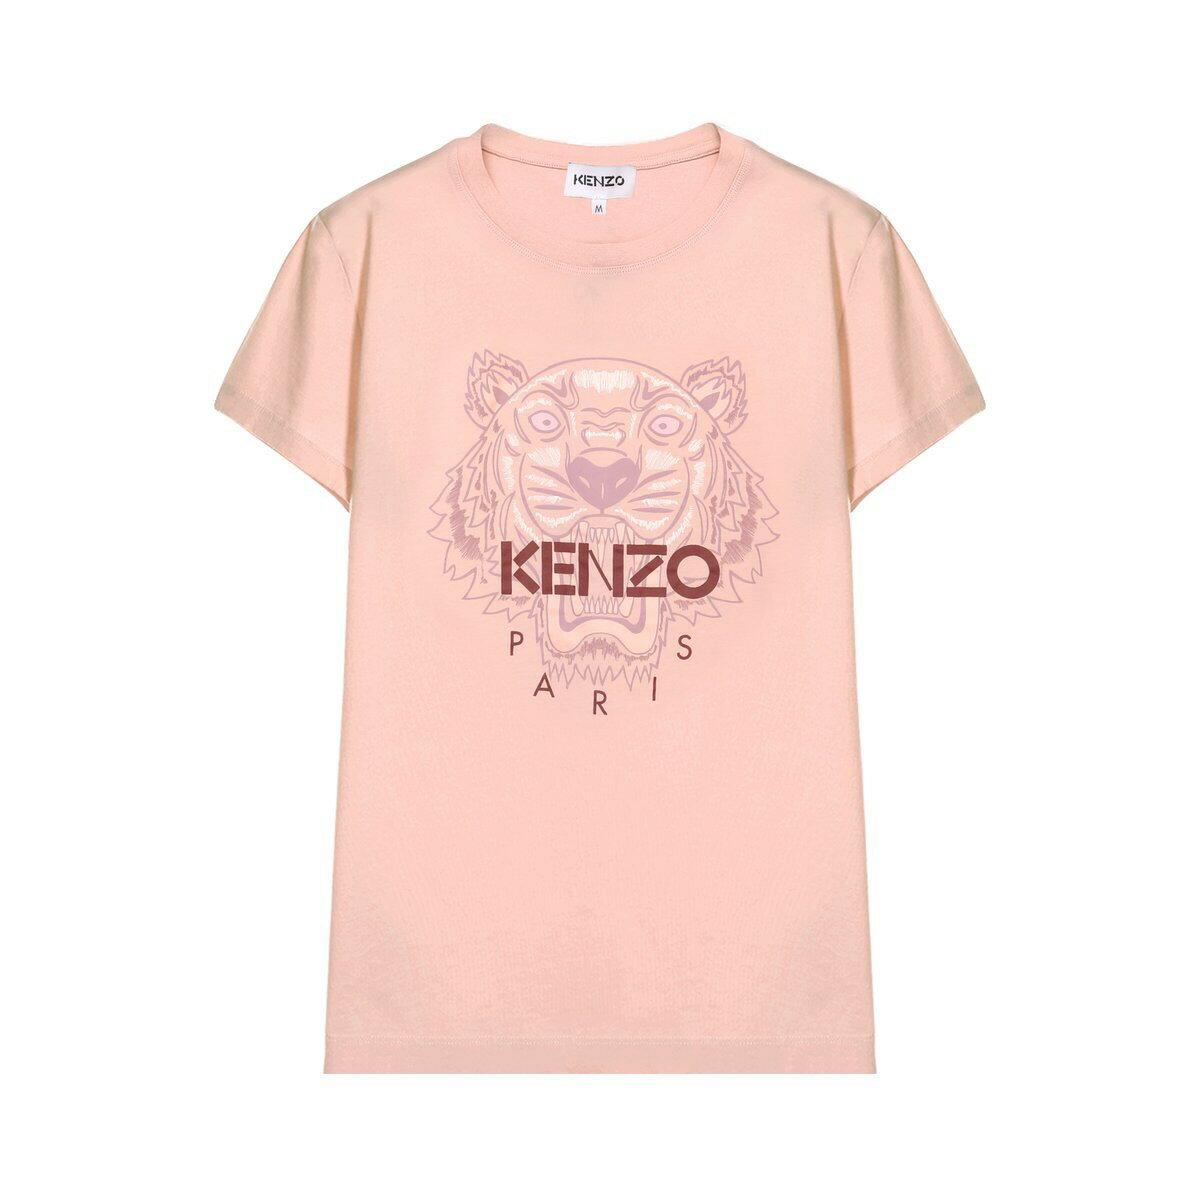 Kenzo女生T恤 尺寸S-XL $3980/件